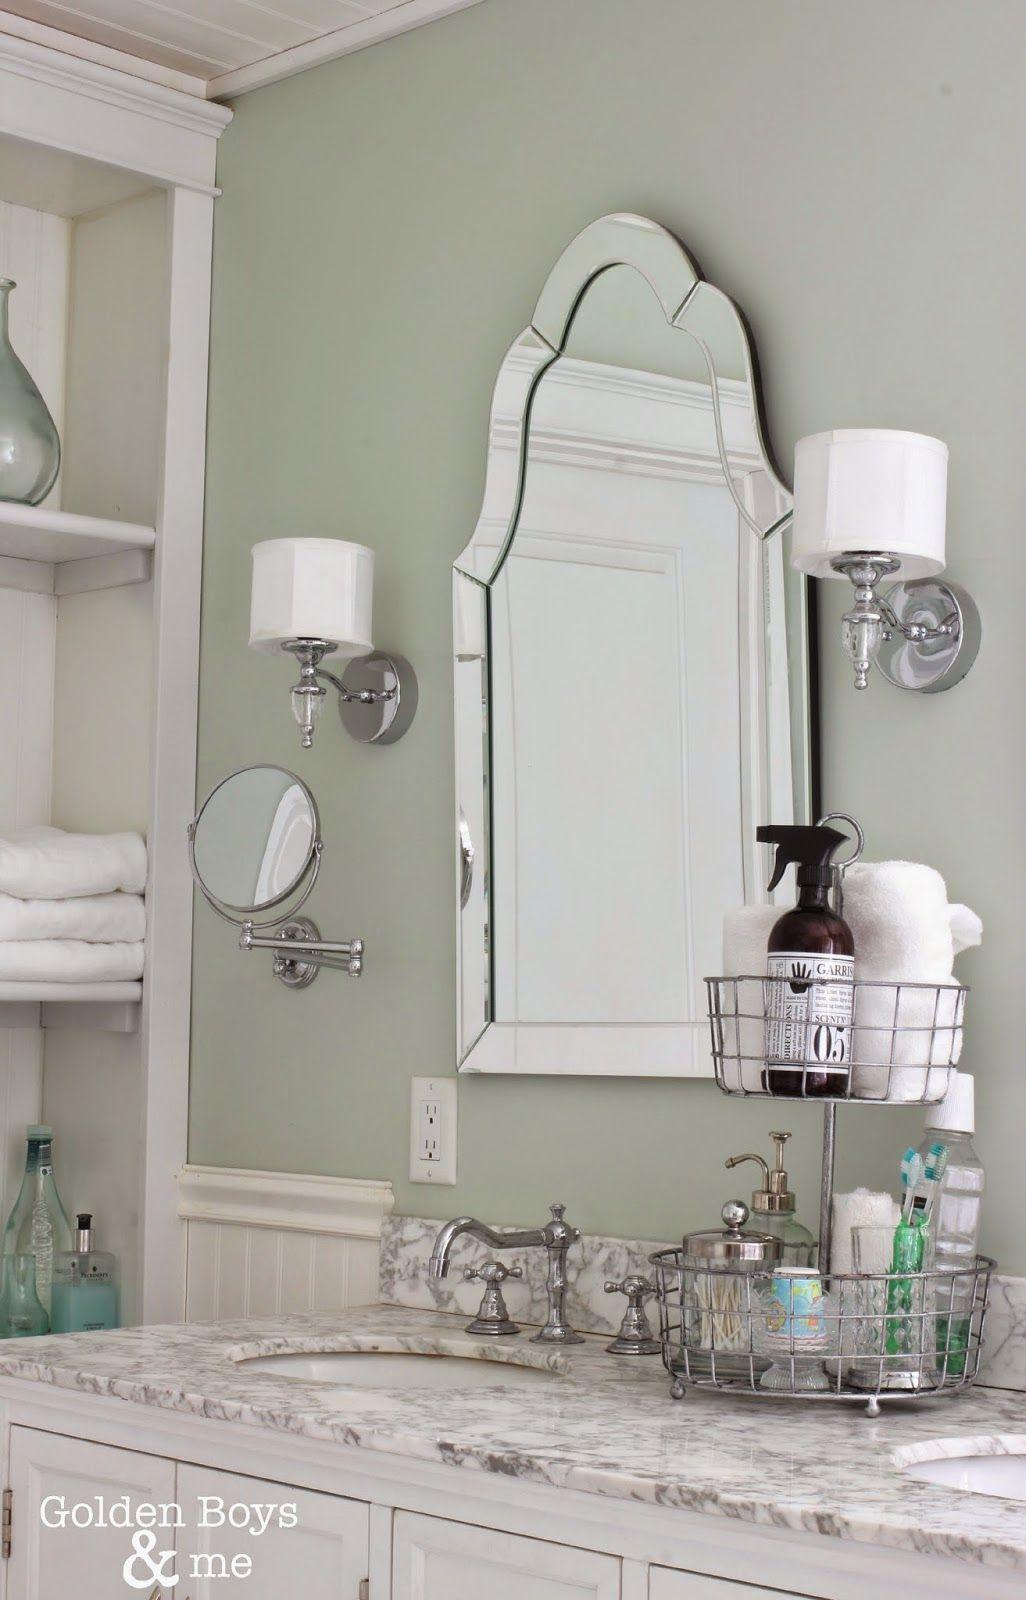 Keepin It Real In Our Master Bath Home Arch Mirror Bathroom Bathroom Decor [ 1600 x 1026 Pixel ]